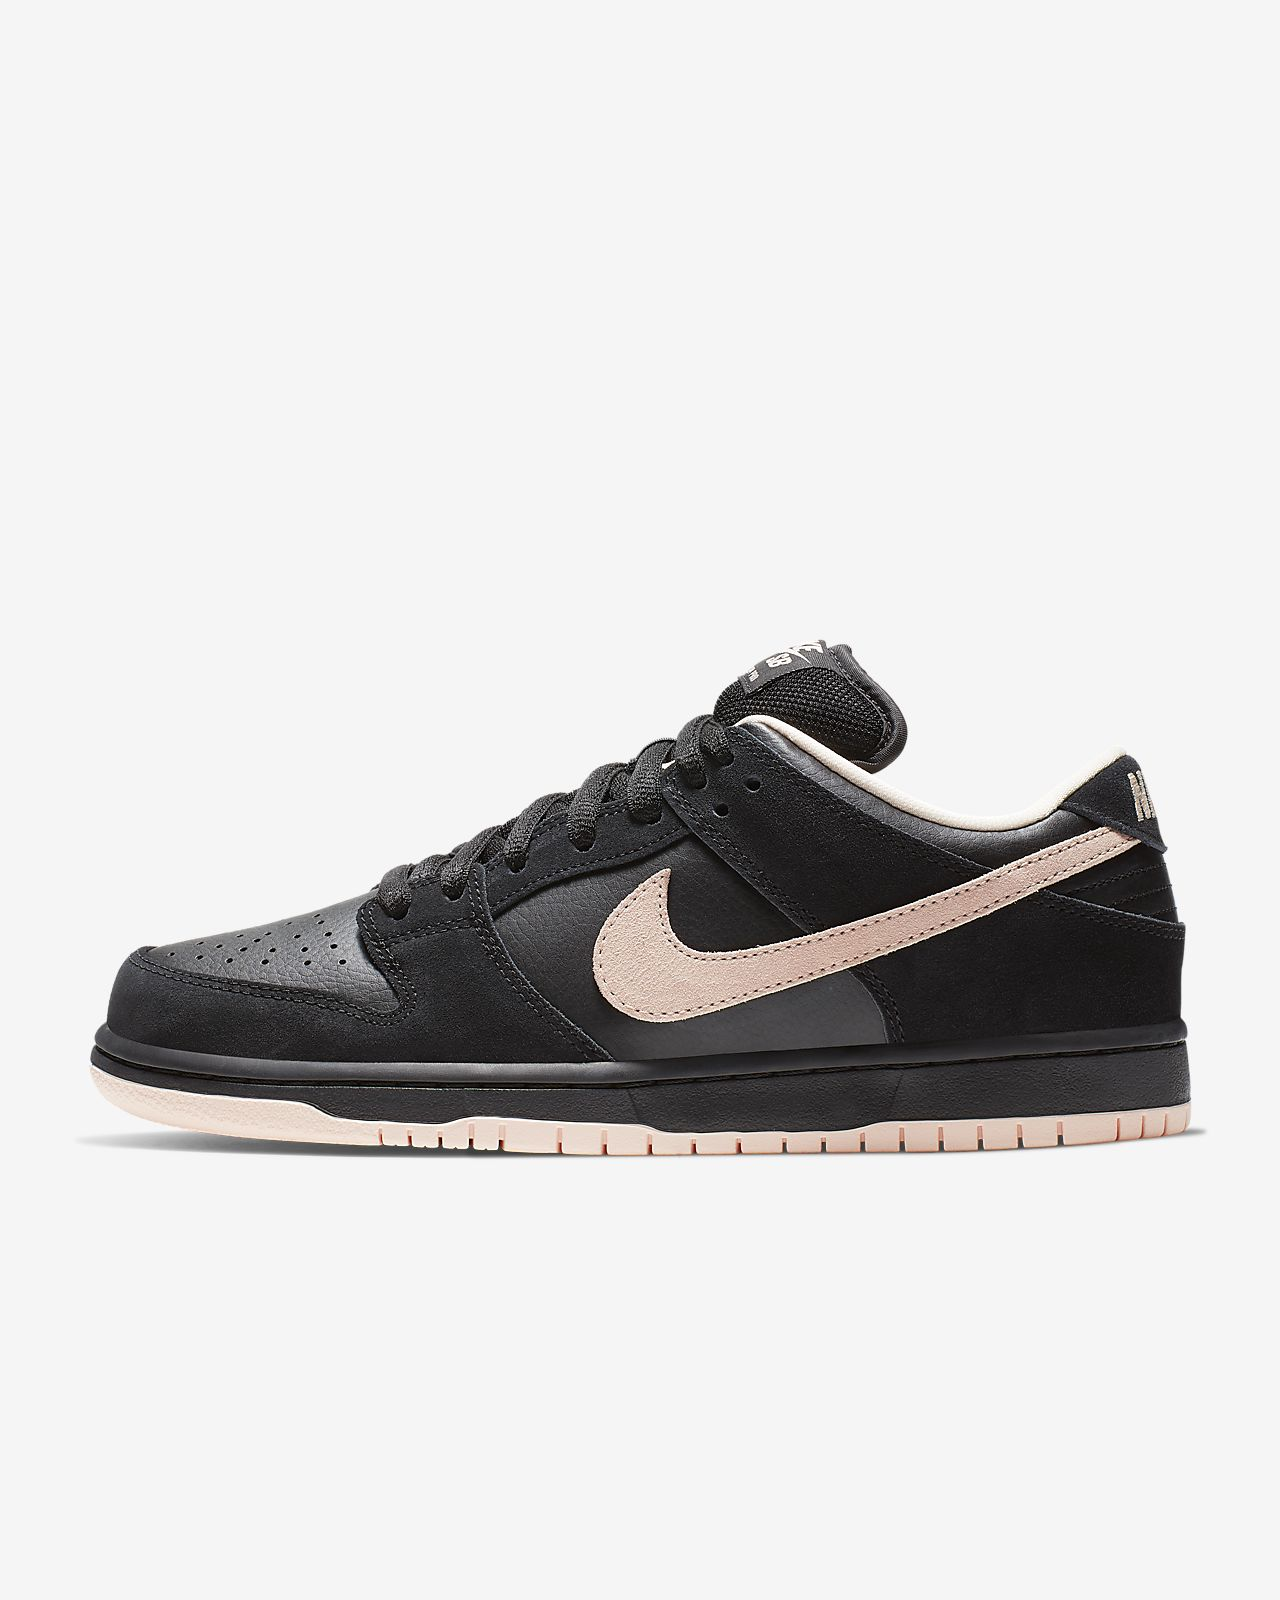 Nike SB Dunk Low Pro男/女滑板鞋